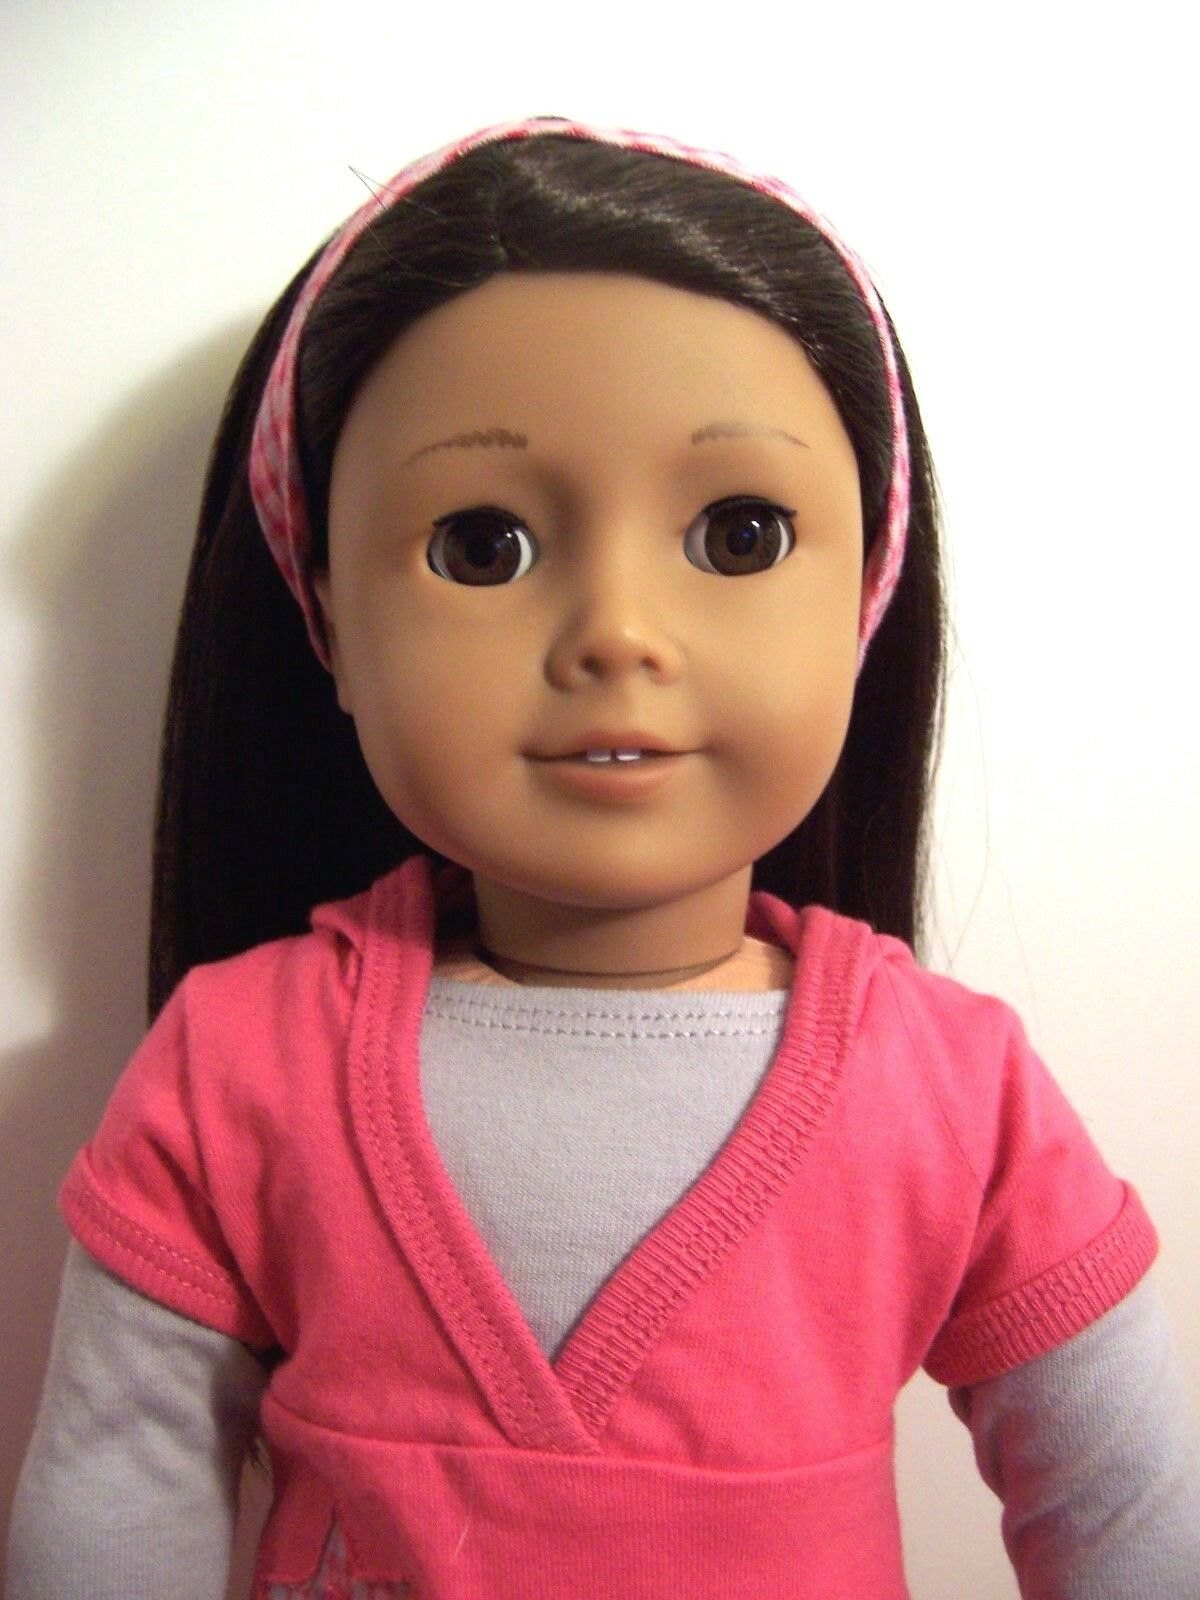 American Girl Doll Cabello Oscuro Marrón Ojos Con Estrella Sudadera Con Capucha Traje